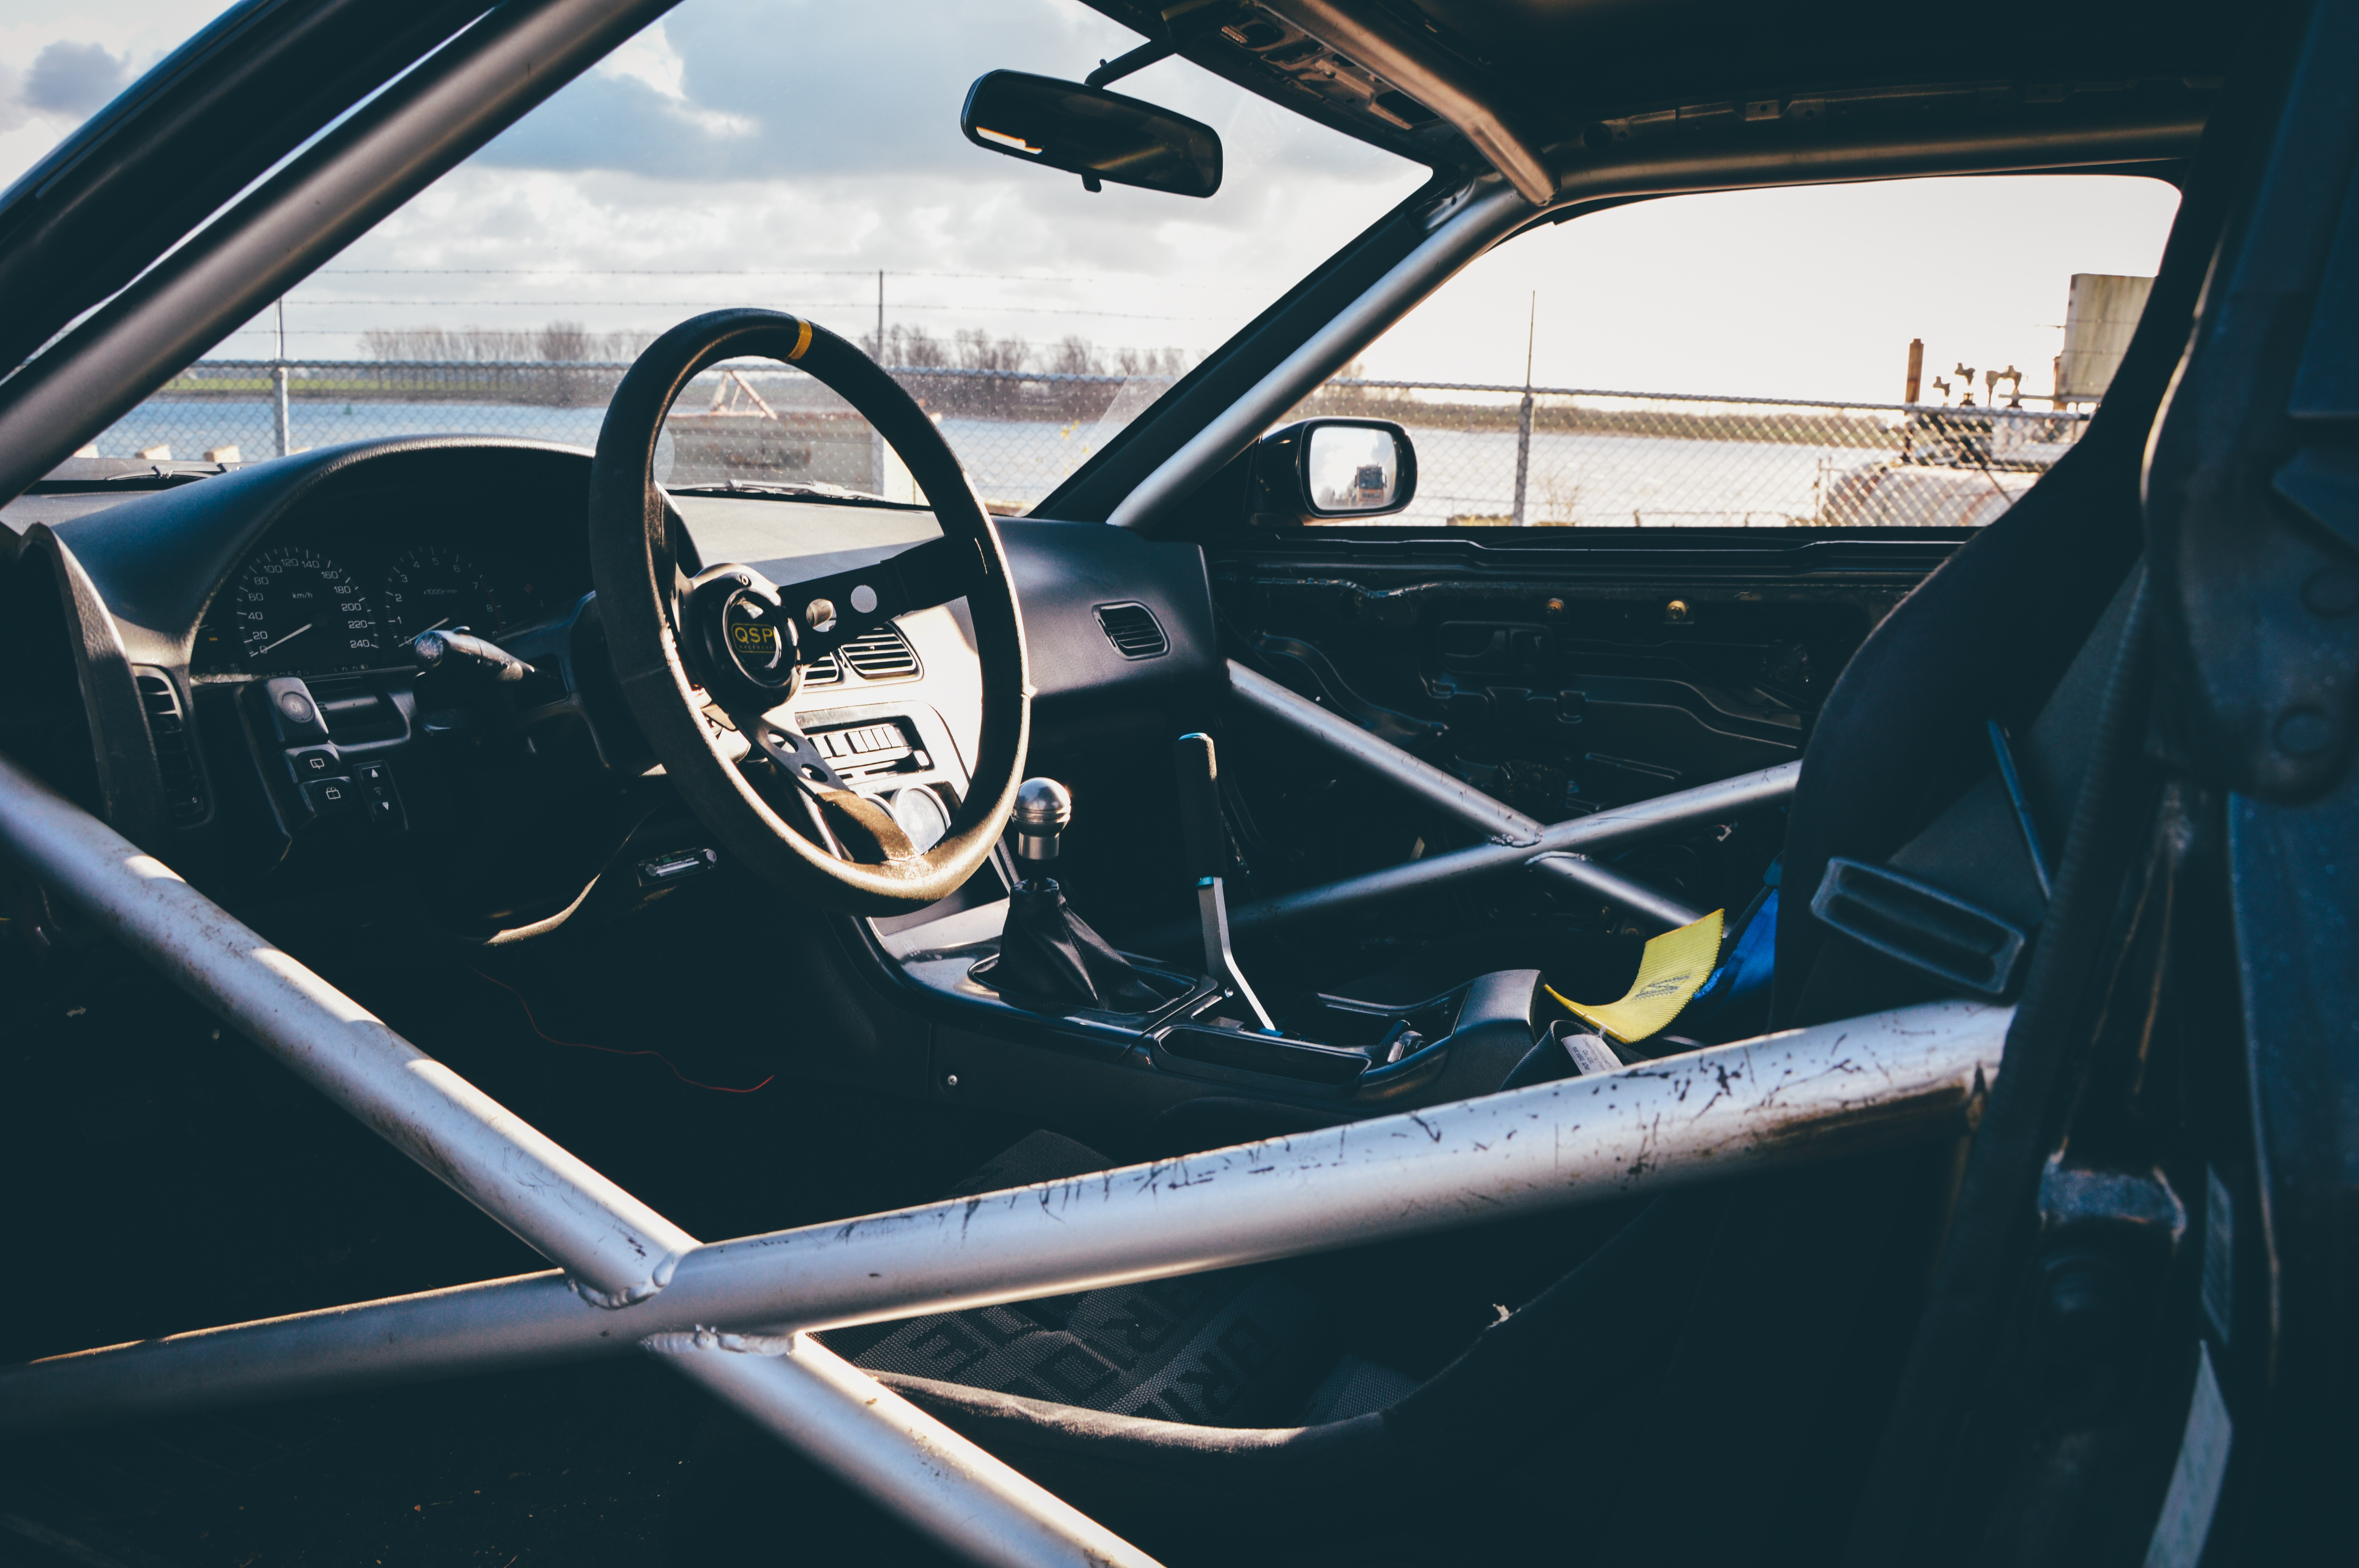 Modified Car, Car, Comfort, Control, Interior, HQ Photo